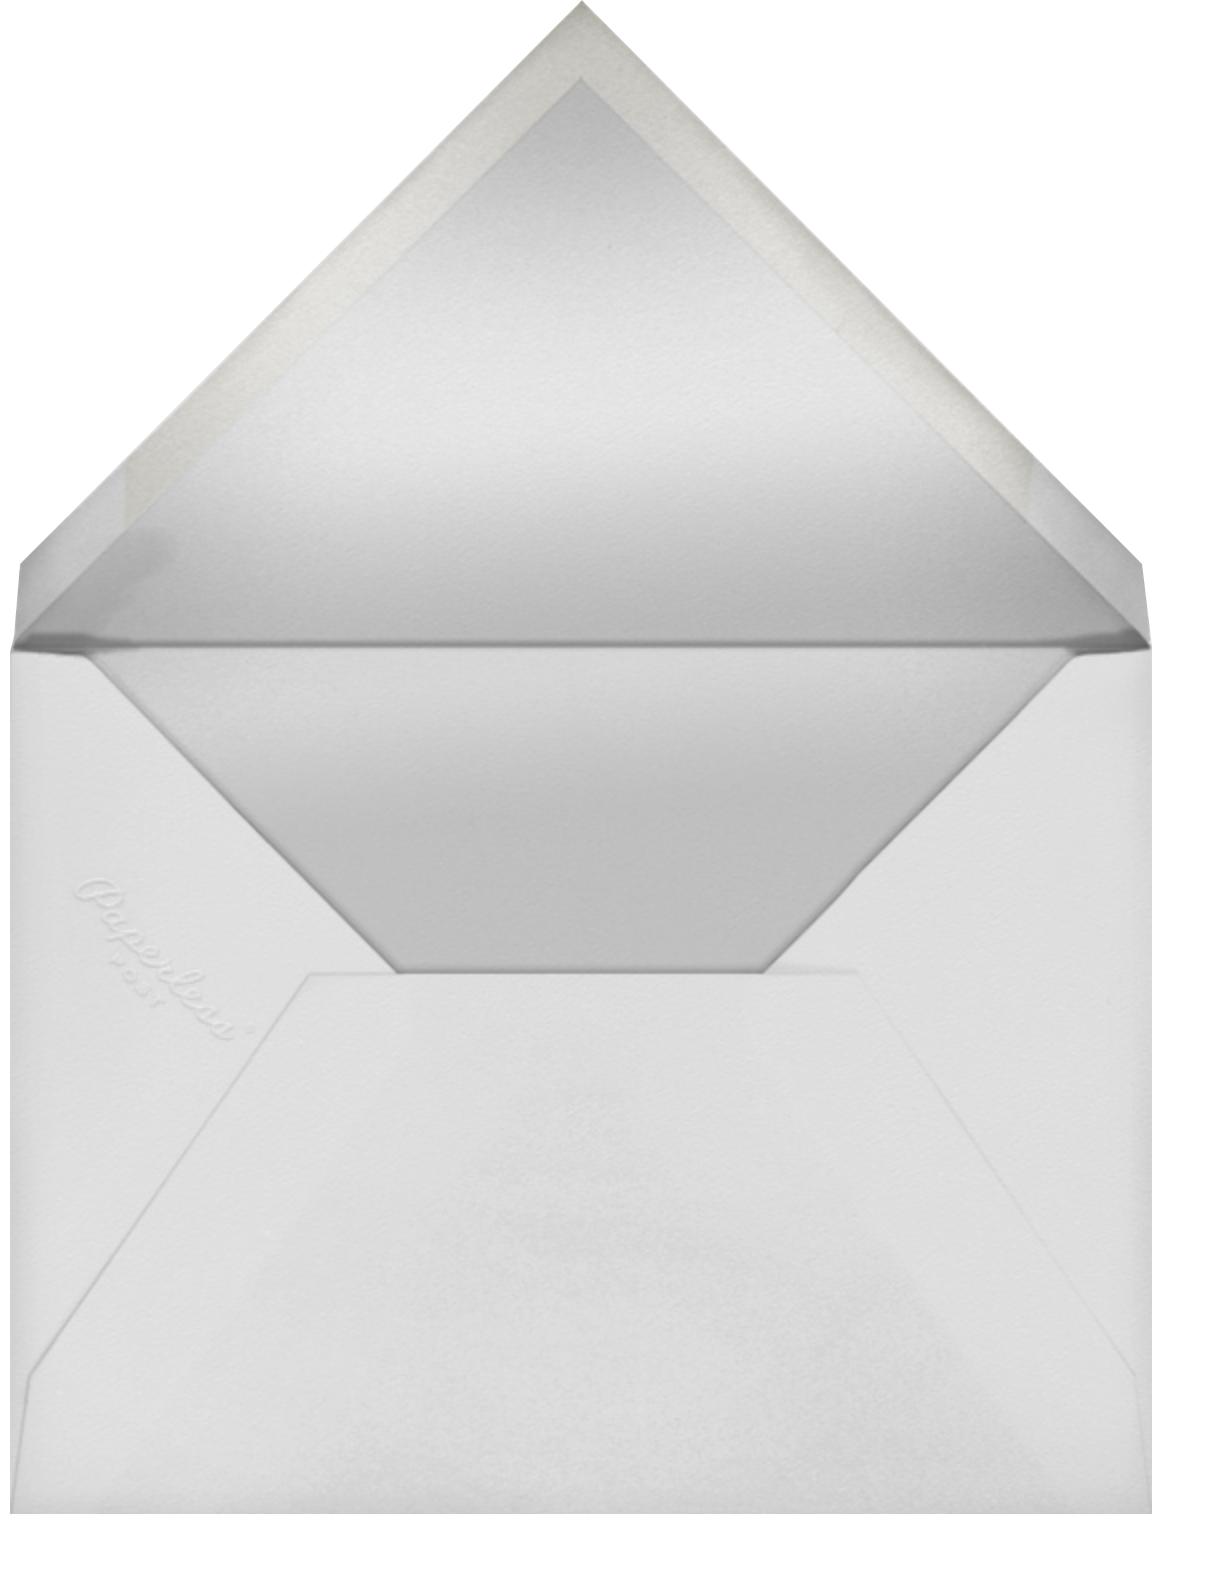 Cirque - Congratulations - Paperless Post - Envelope